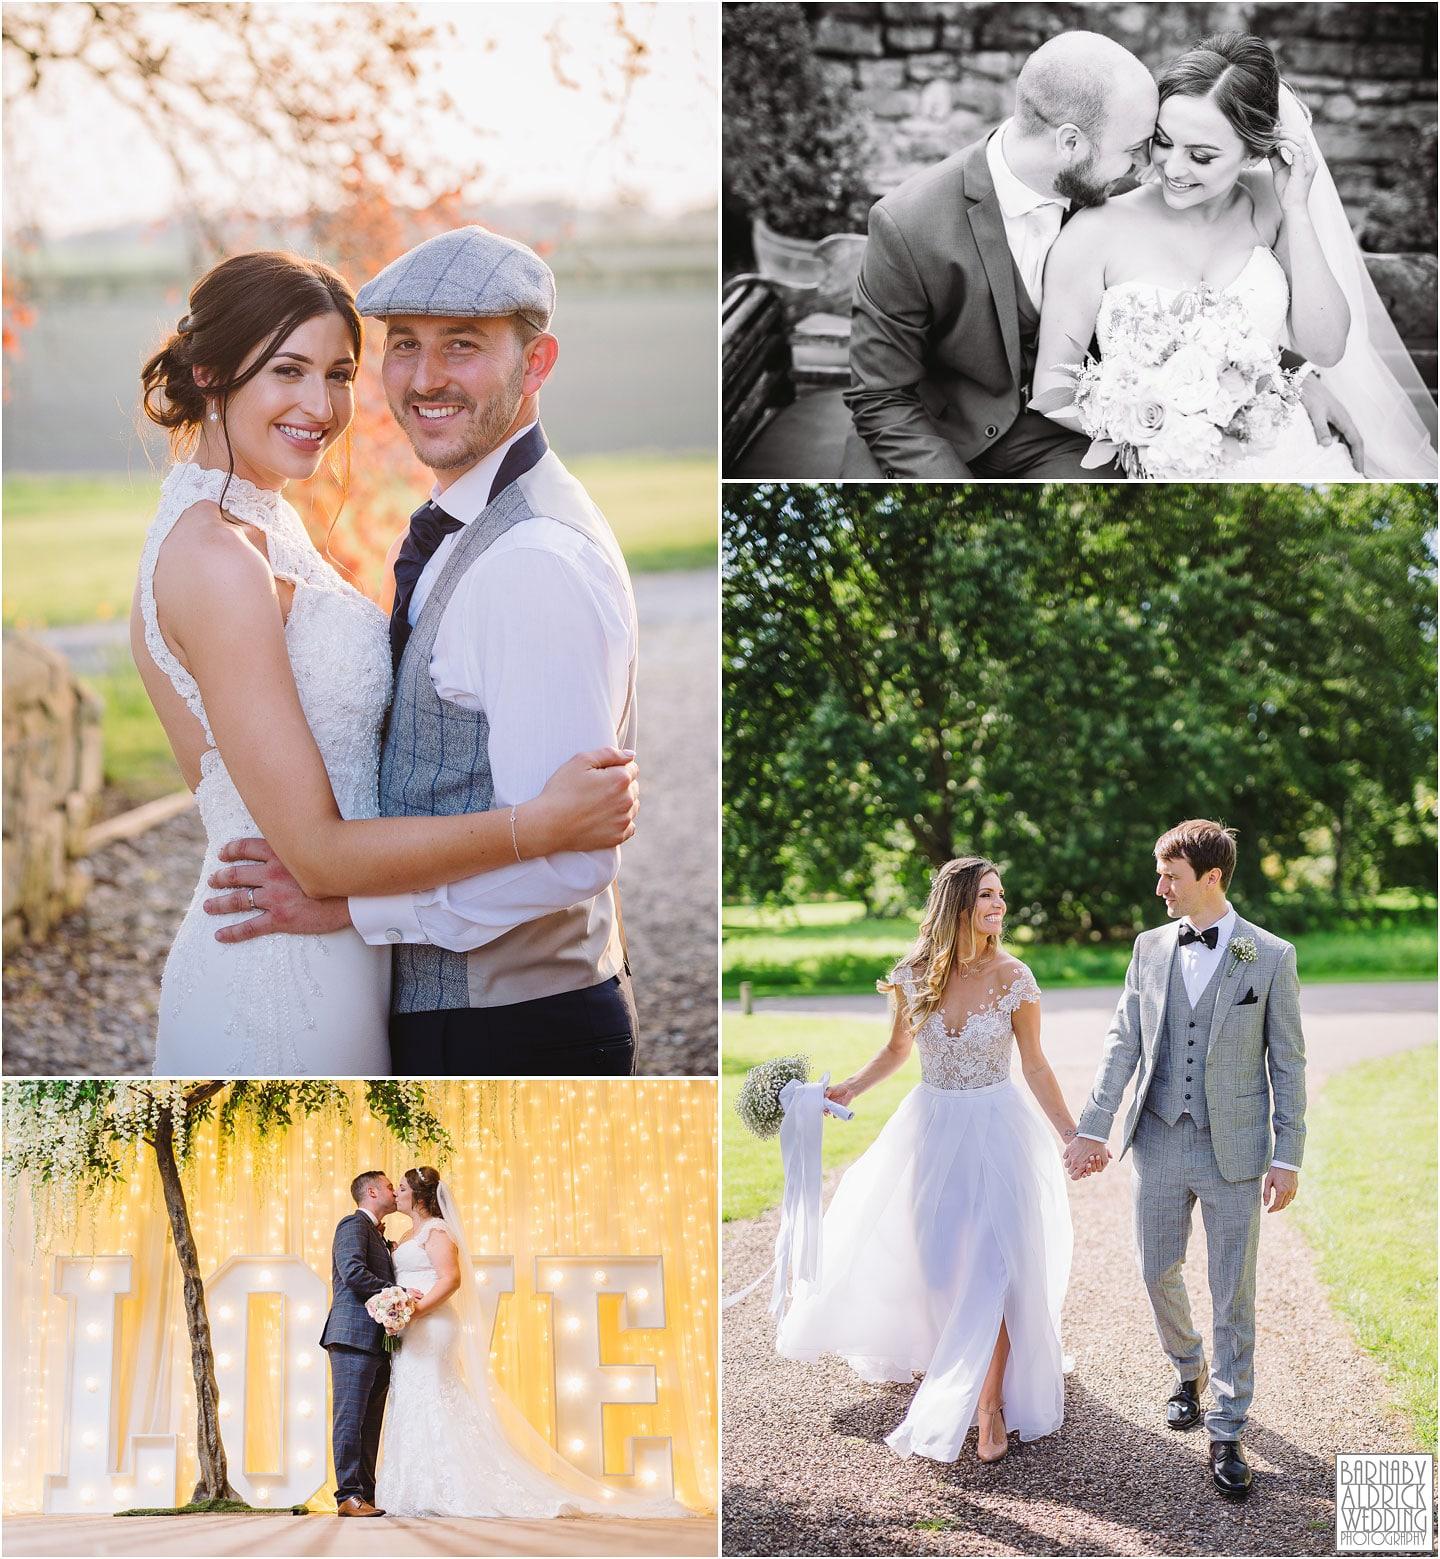 Best Wedding portraits 2019